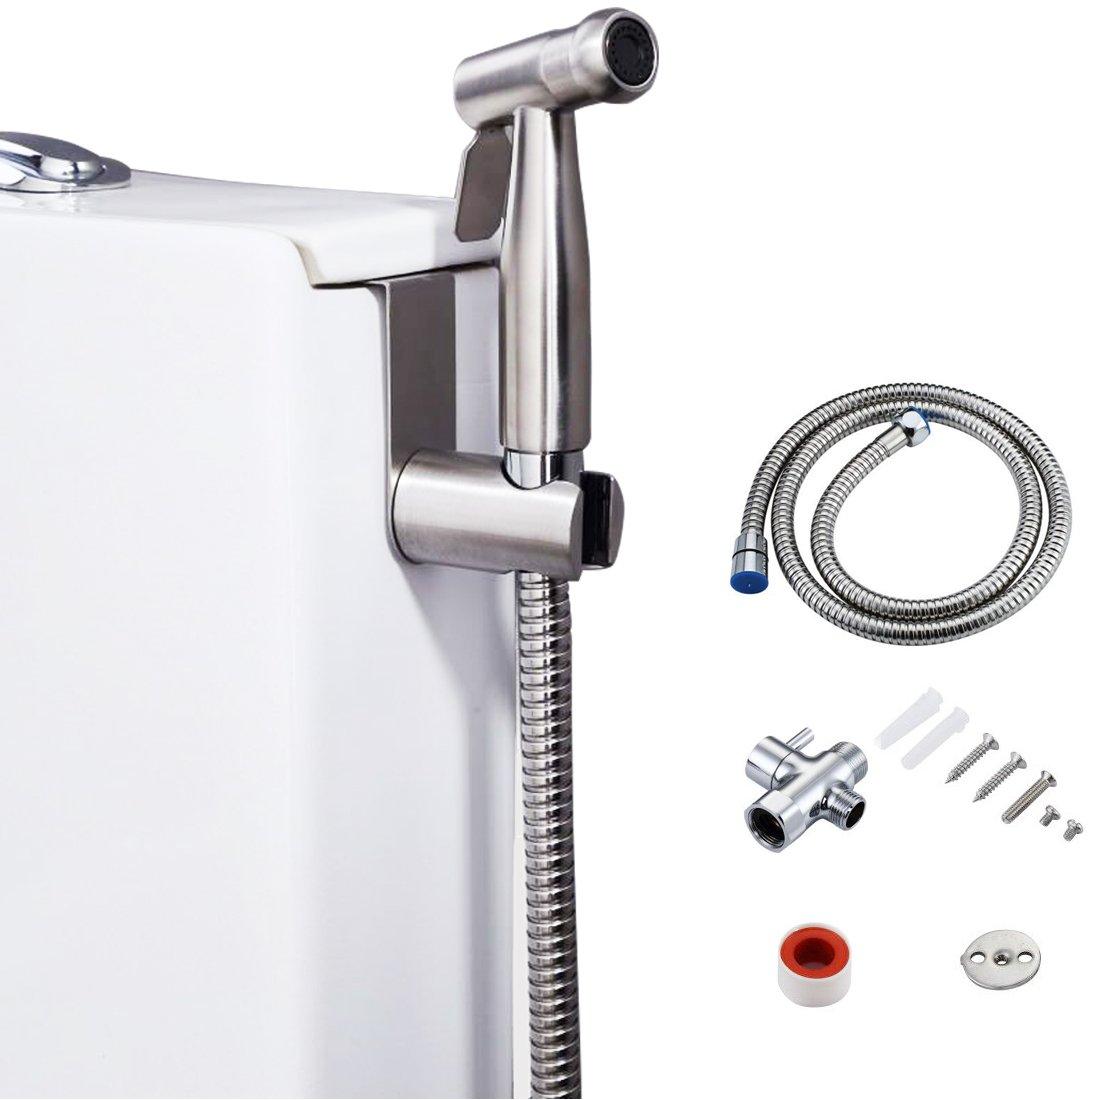 Bidet Sprayer Toilet Sprayer/Handheld Stainless Steel Sprayer with Chrome Finish Brass T-Valve Adapter for Personal Hygiene & Cleaning by Myartte